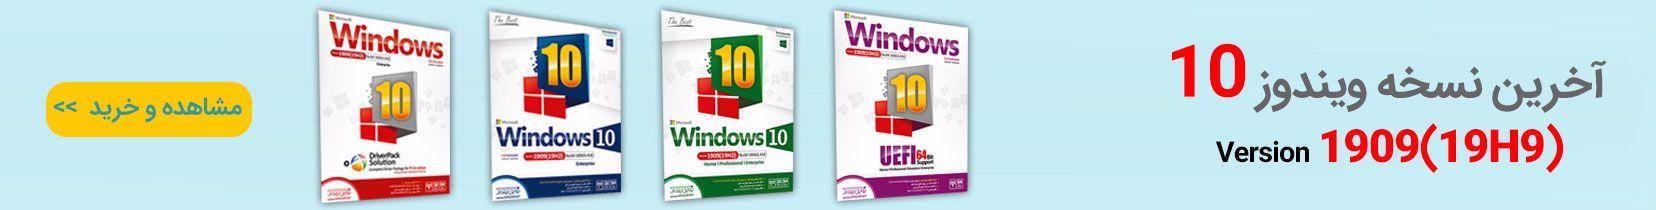 آخرین نسخه ویندوز 10 نسخه 19H9